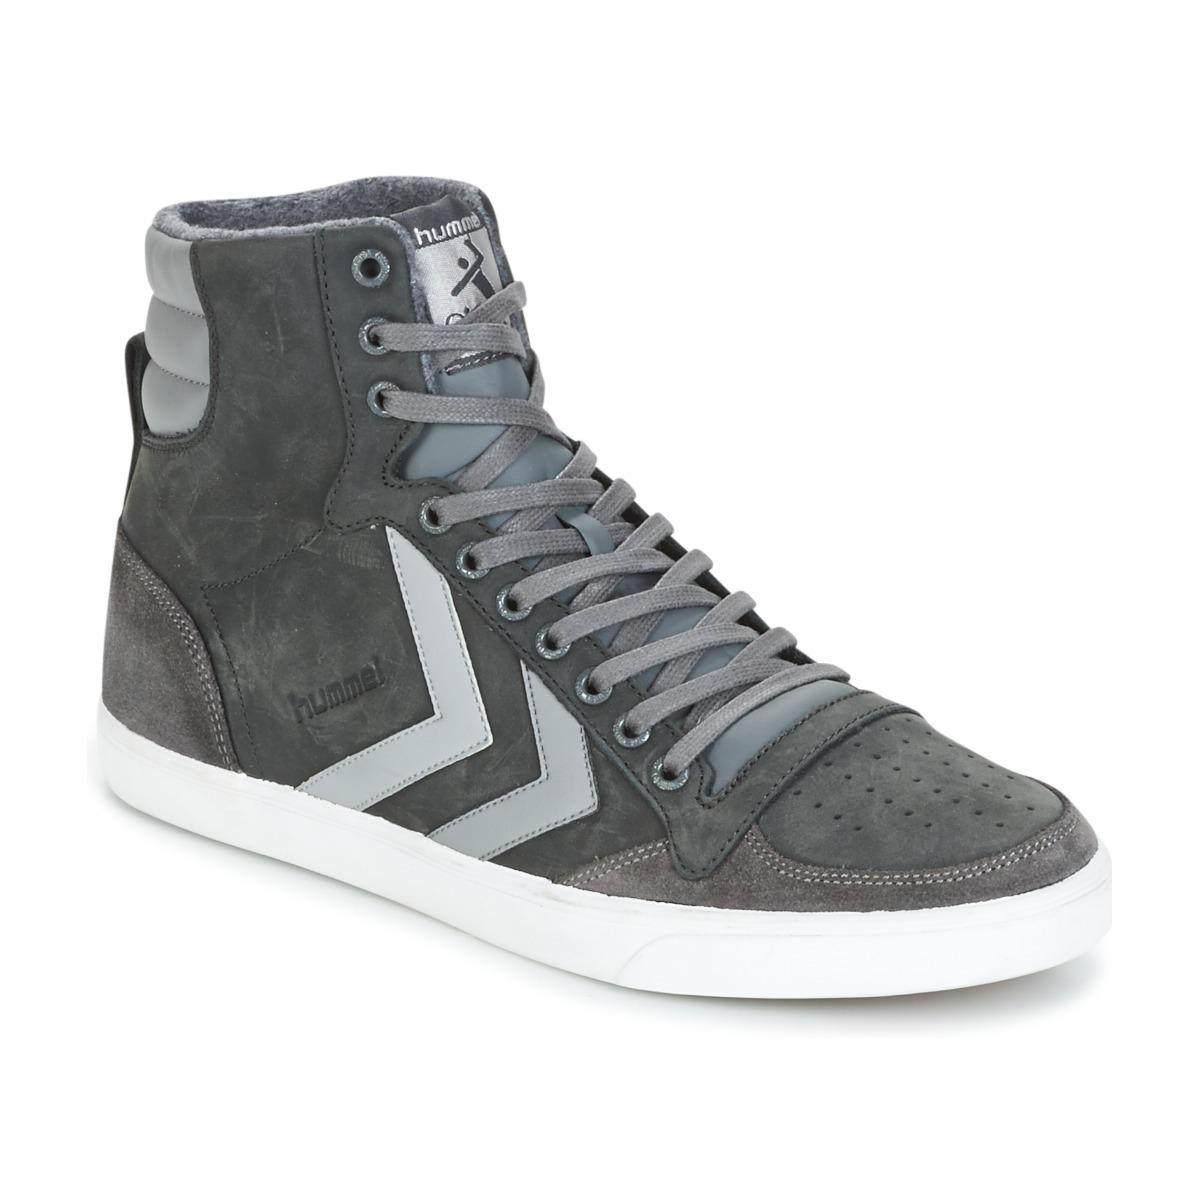 Mono Stadil Mince Huilée Haute - Chaussures - High-tops Et Chaussures De Sport Hummel 7OjNRqXByh